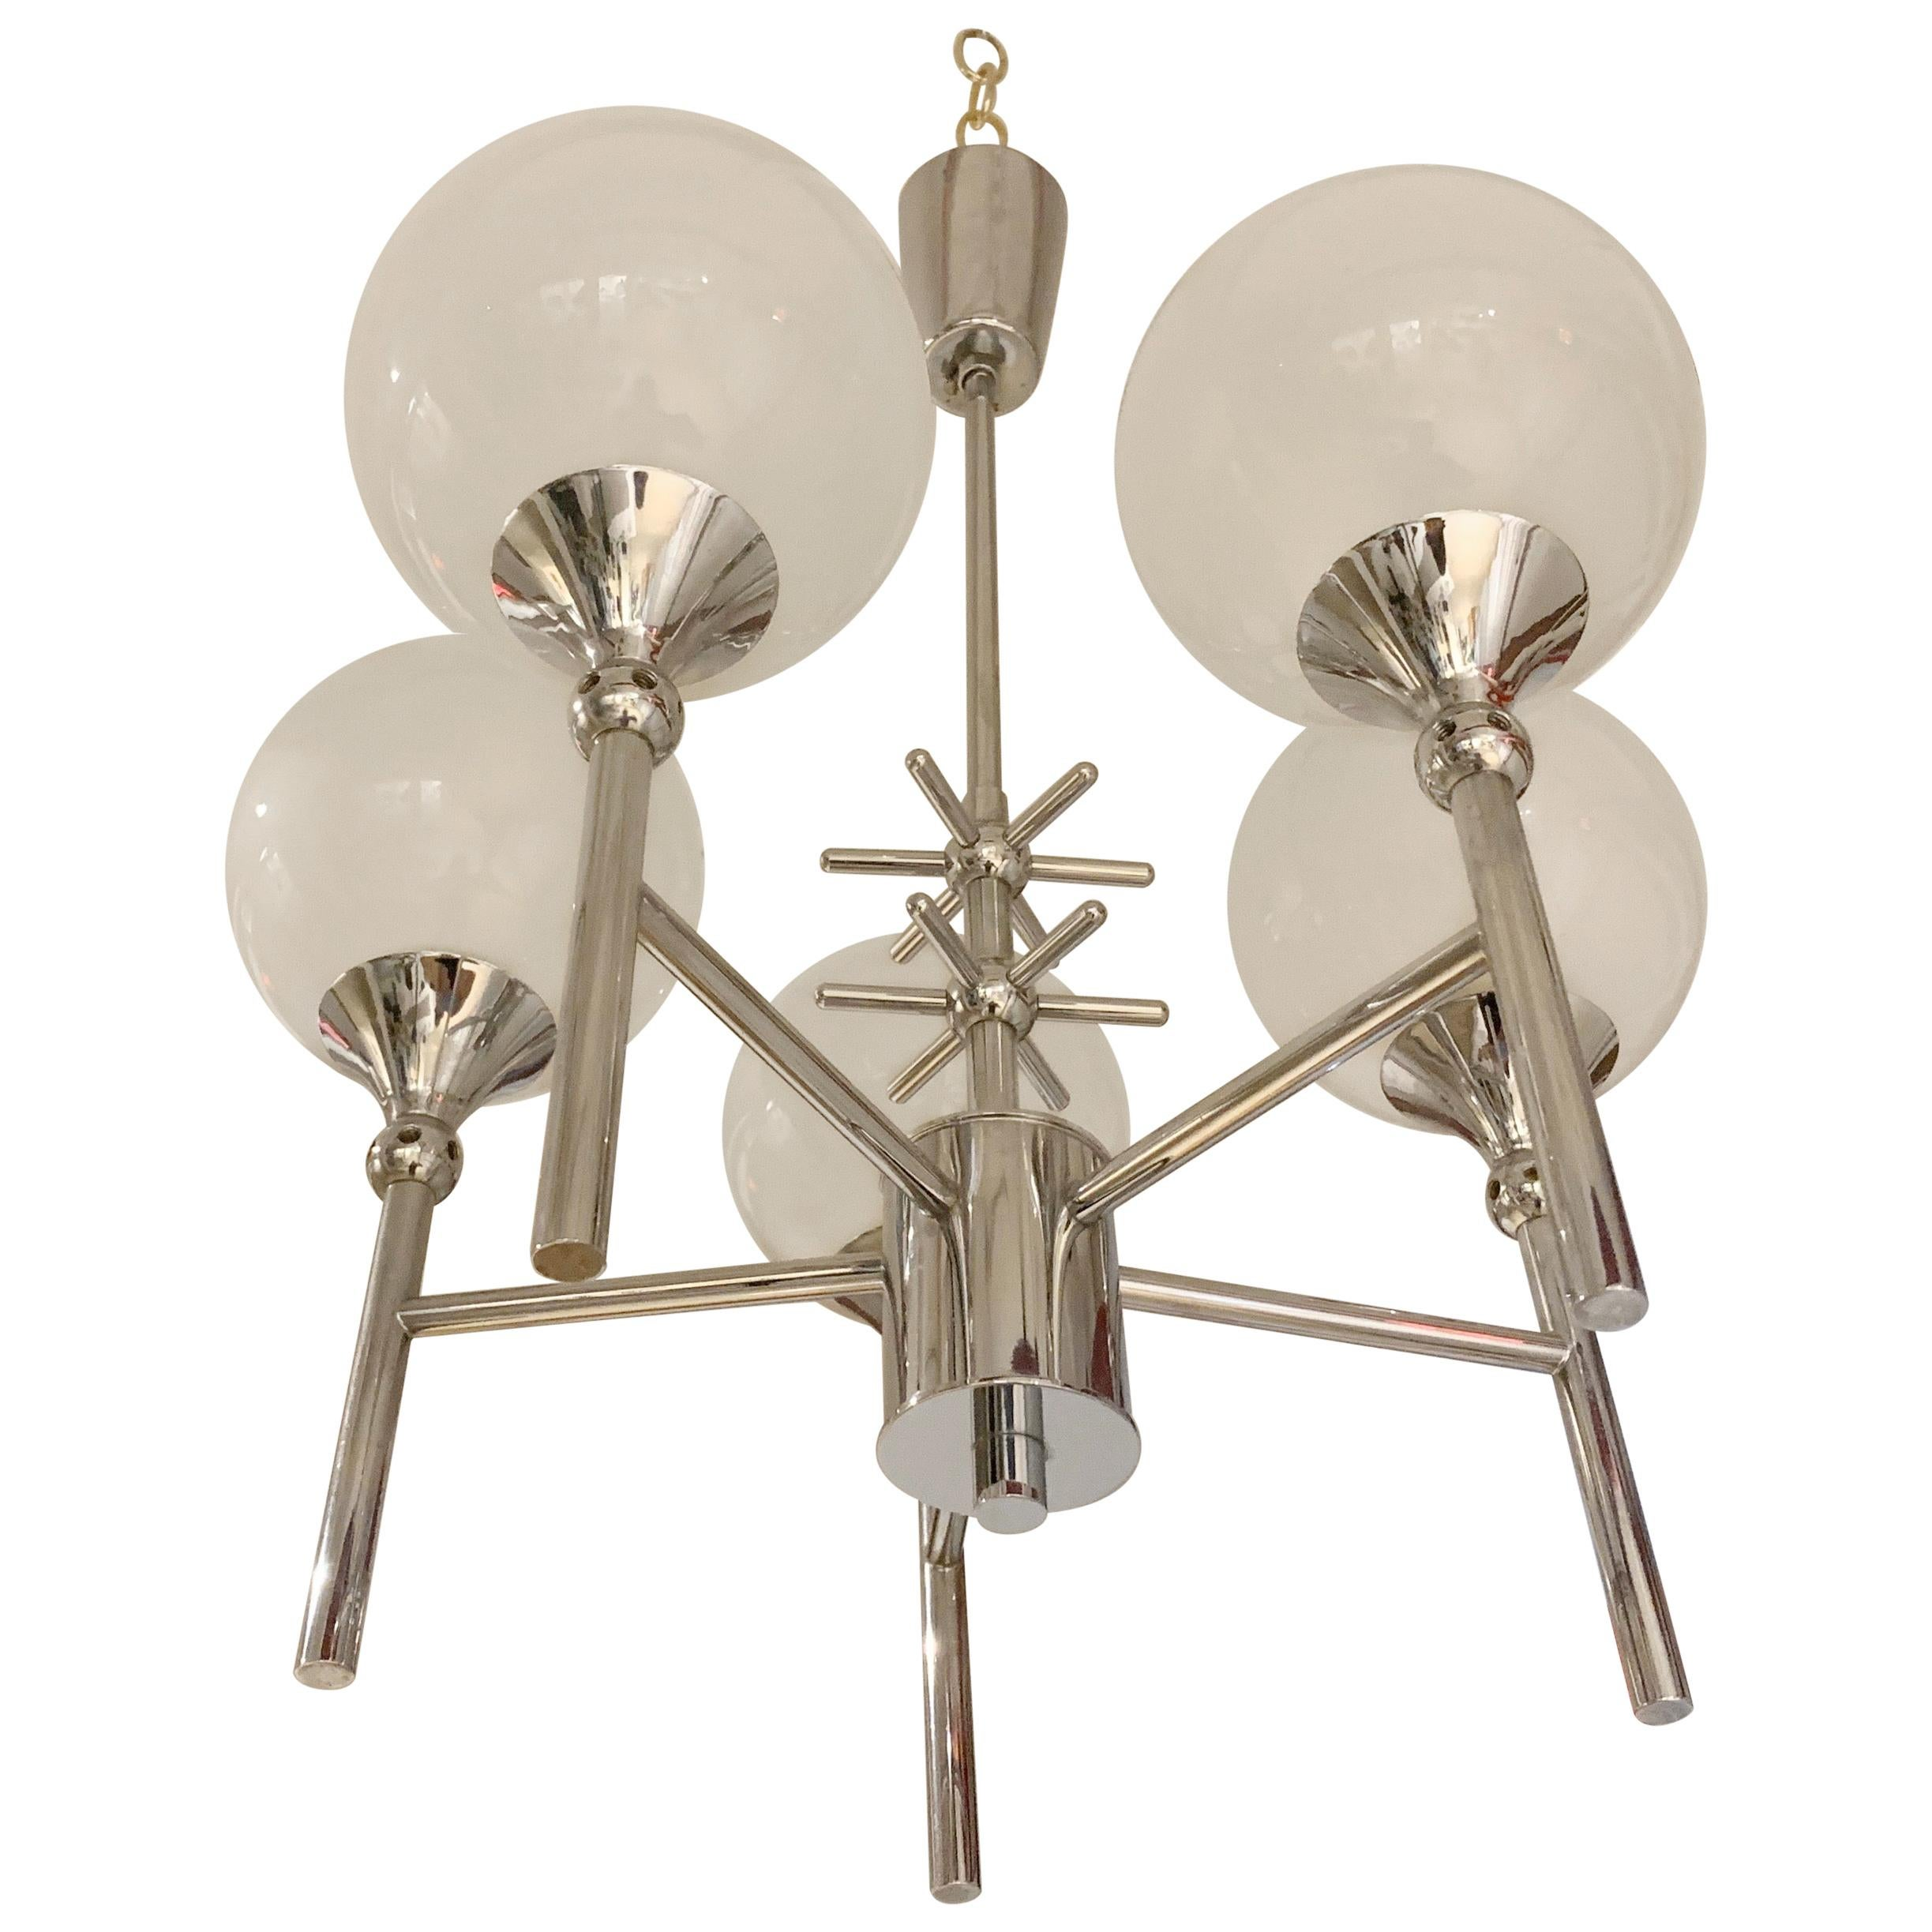 French Opaline Whimsical 1970s 5-Light Pendants